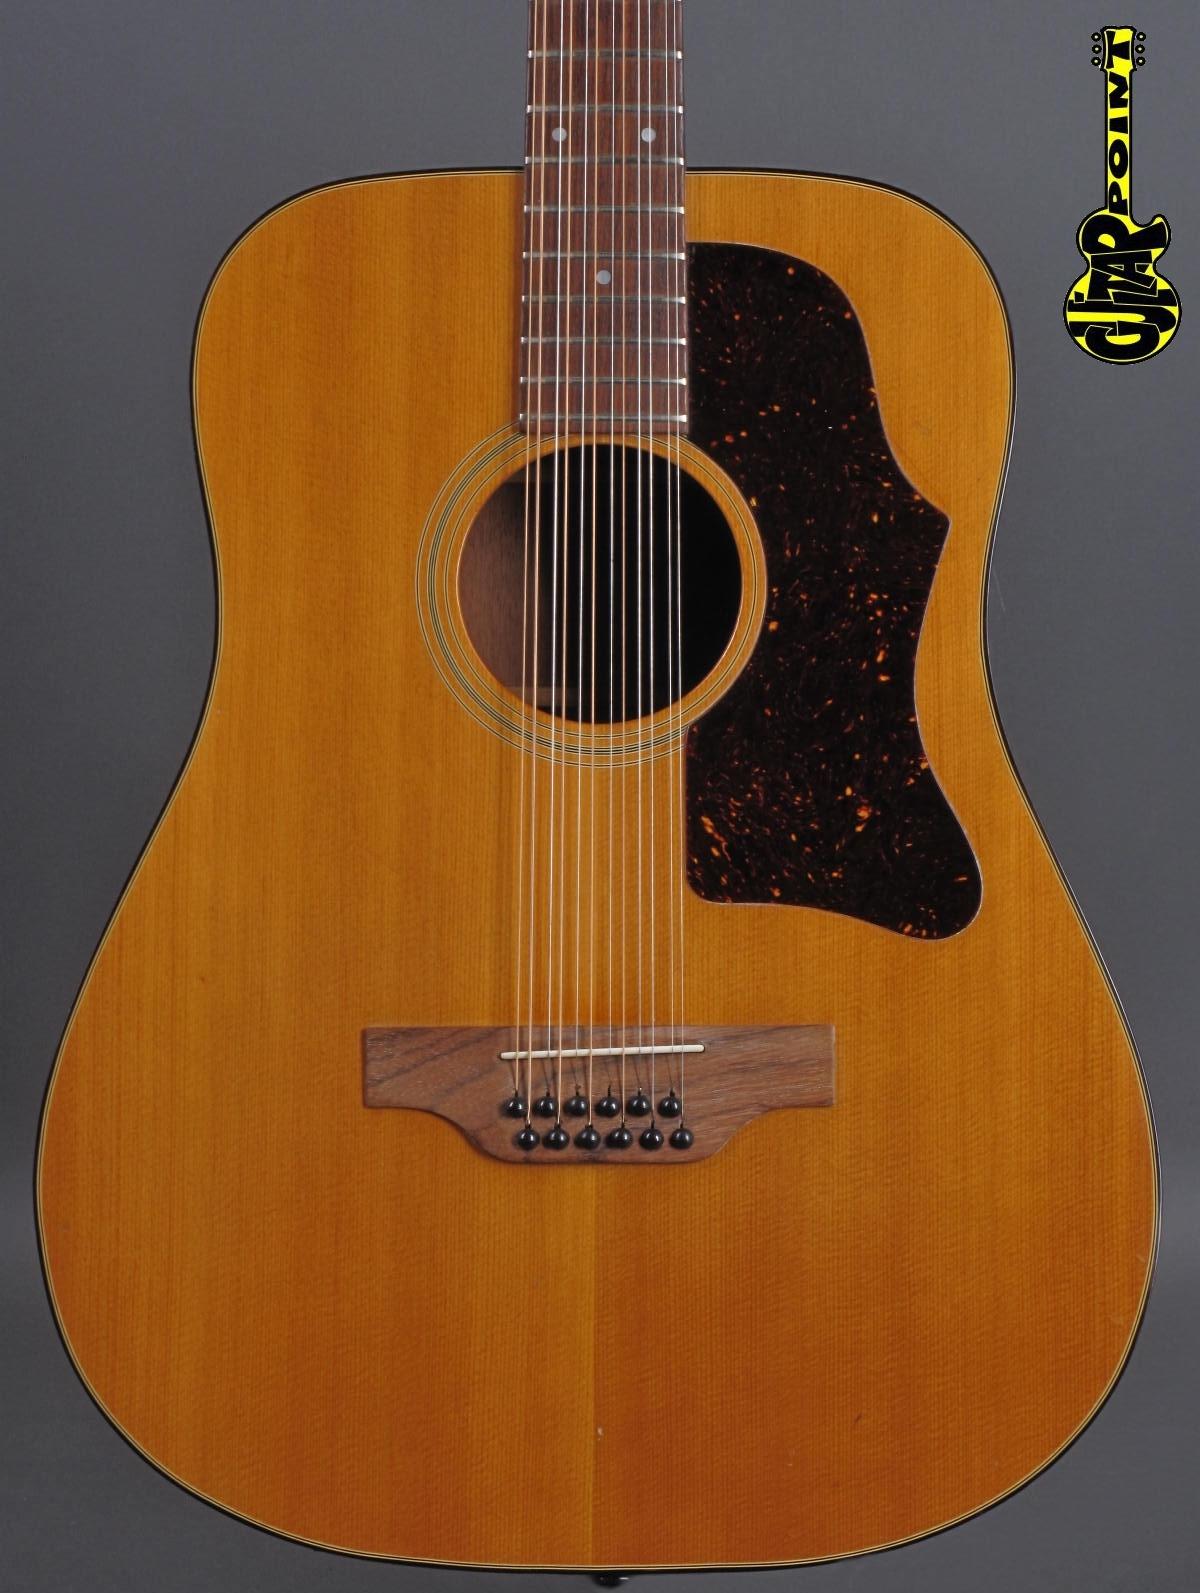 1976 Gibson B-45 12-string - Natural